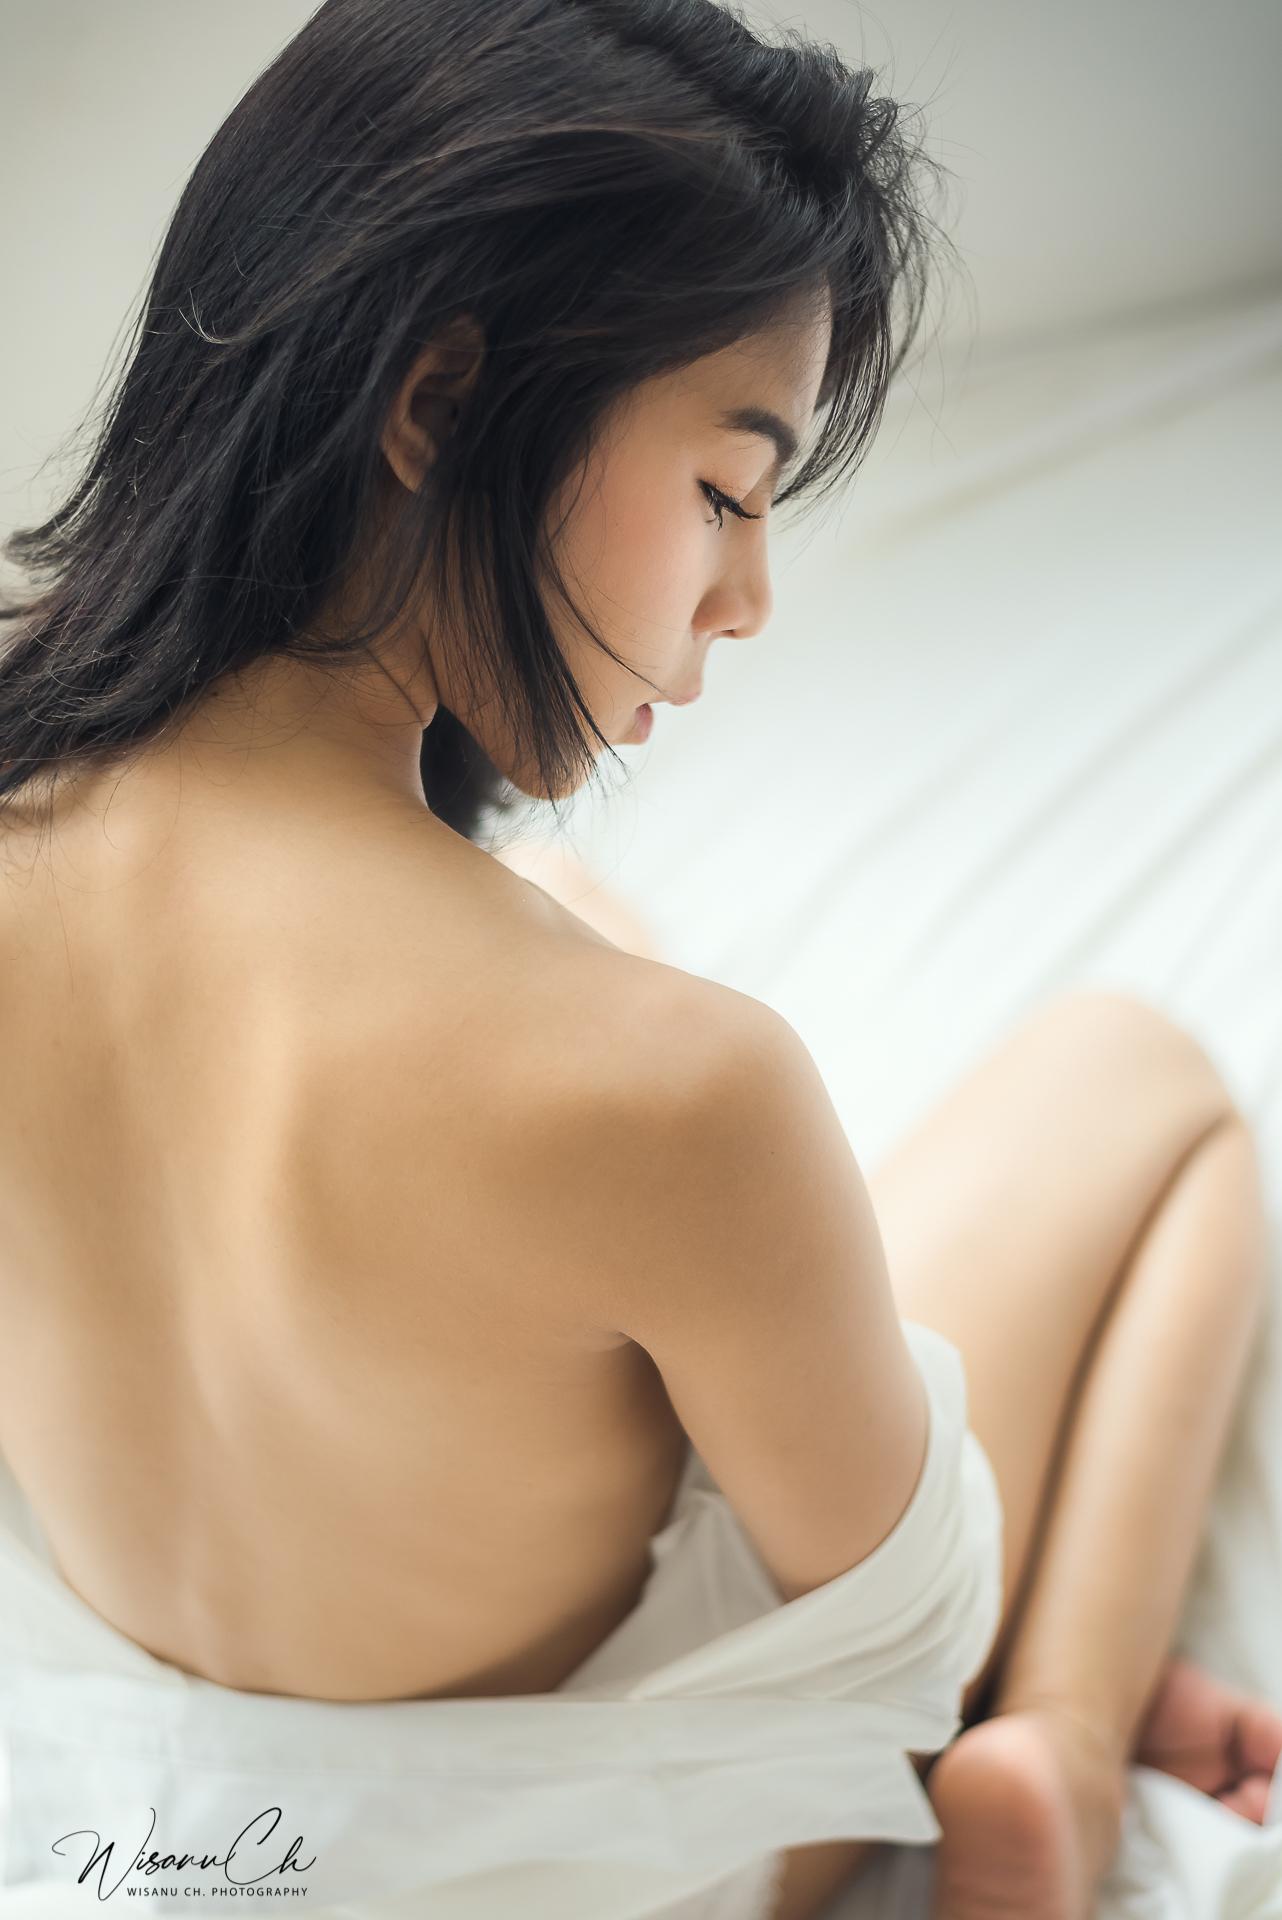 Desire - Jeerachat Yamsang